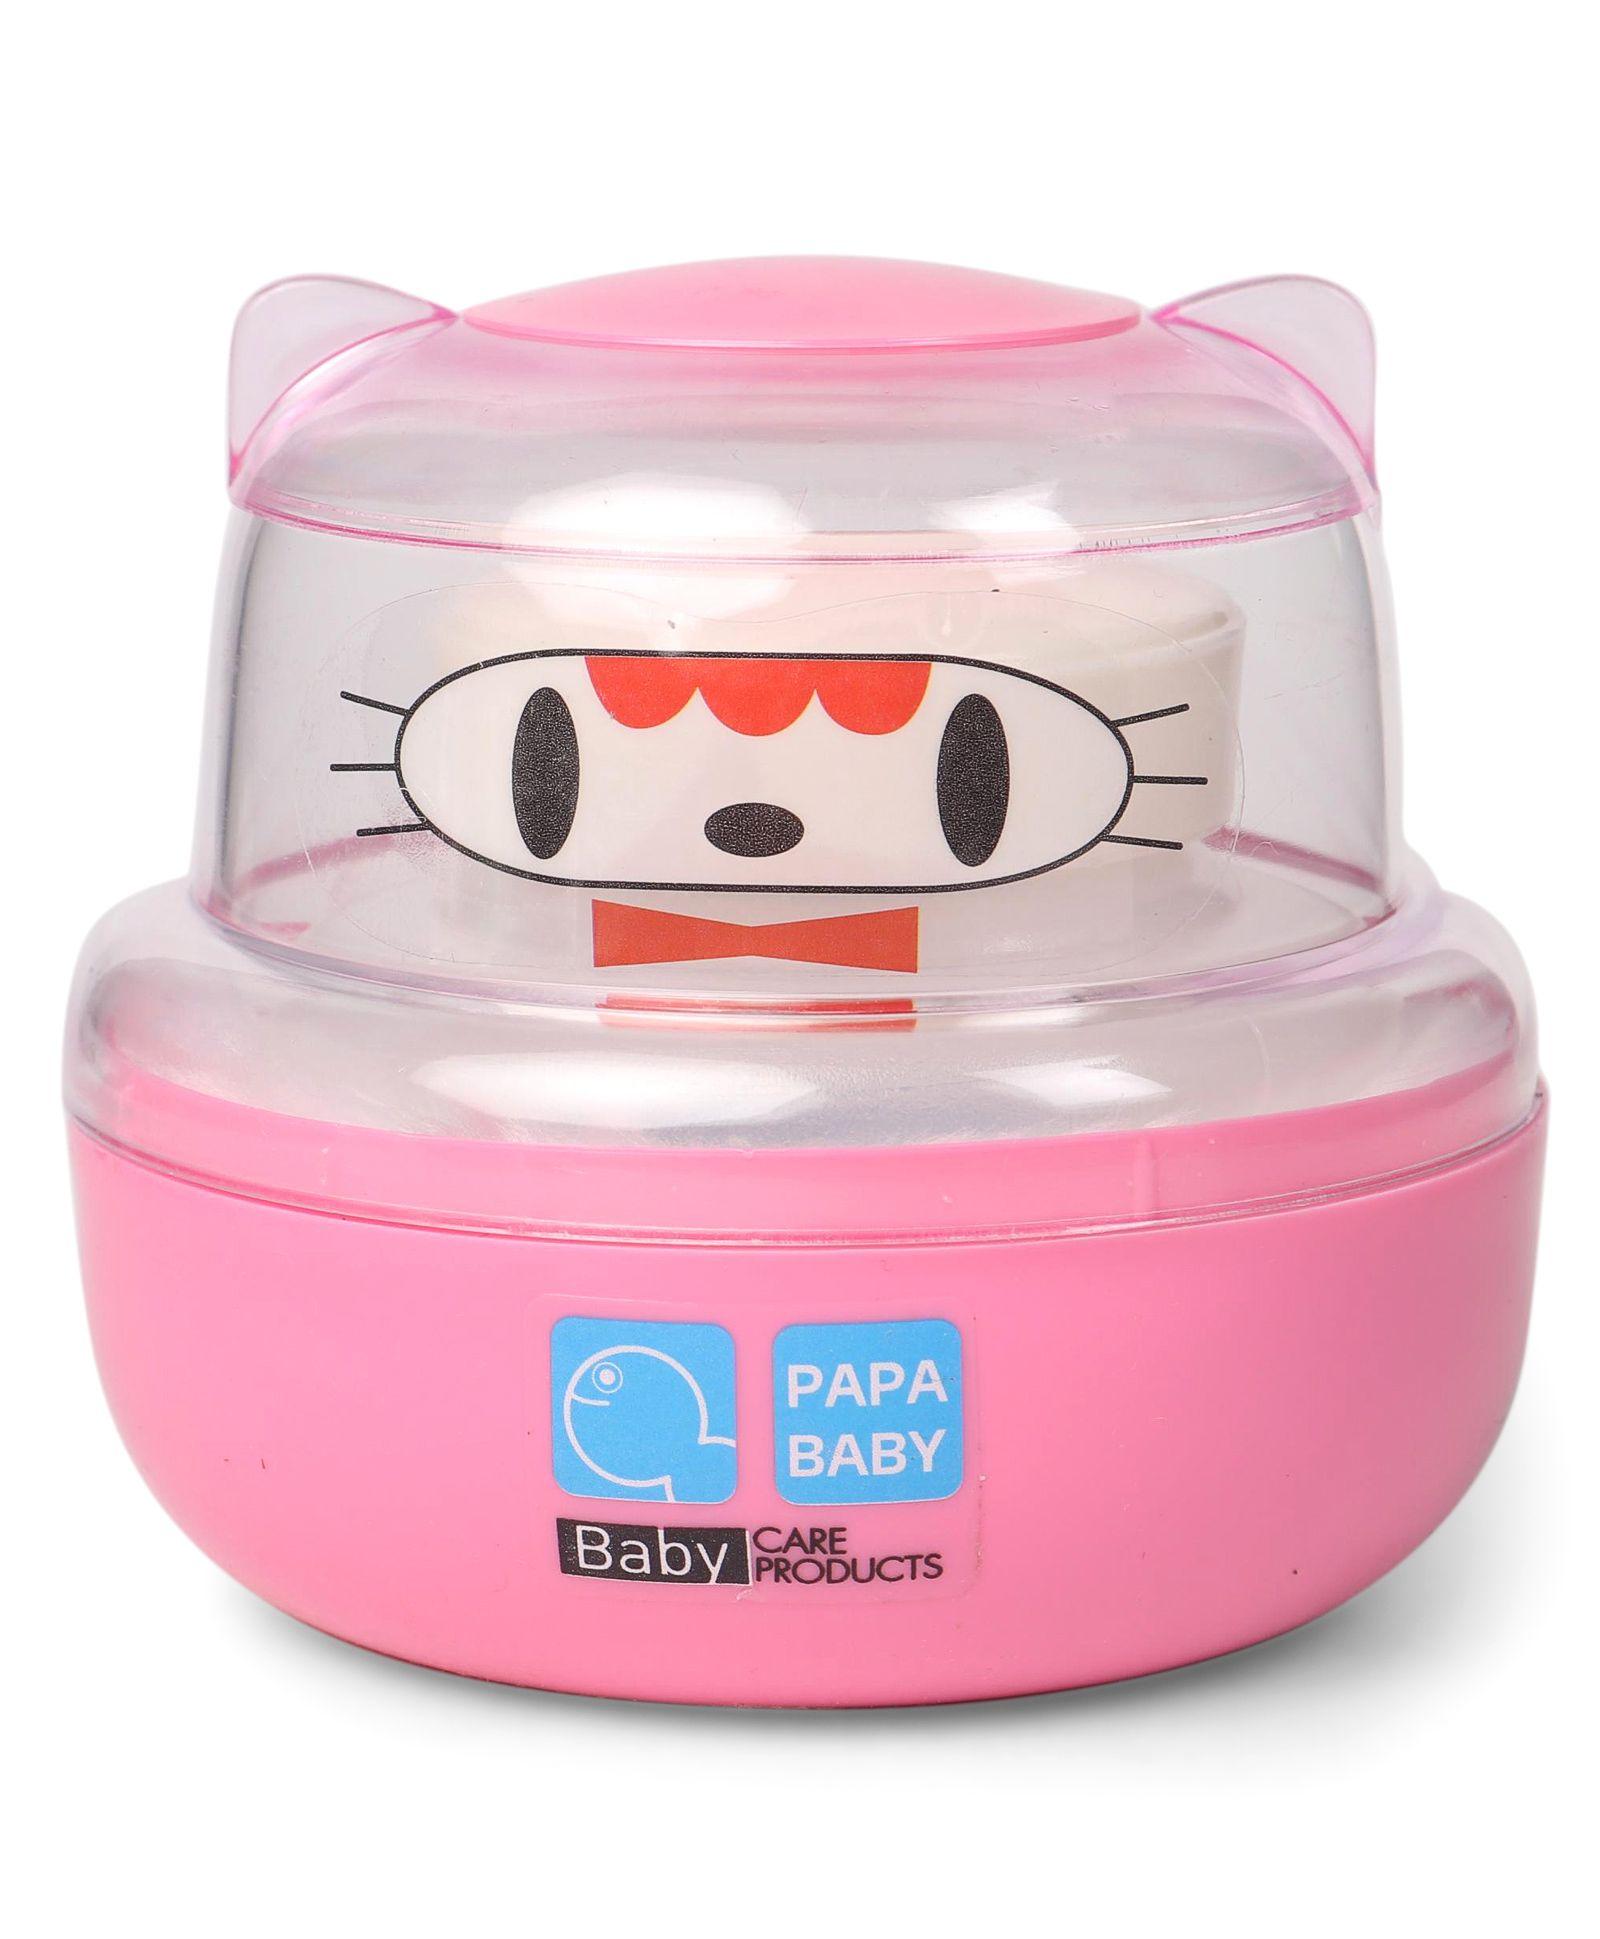 Papa Baby Powder Puff Kitty Face Design - Pink